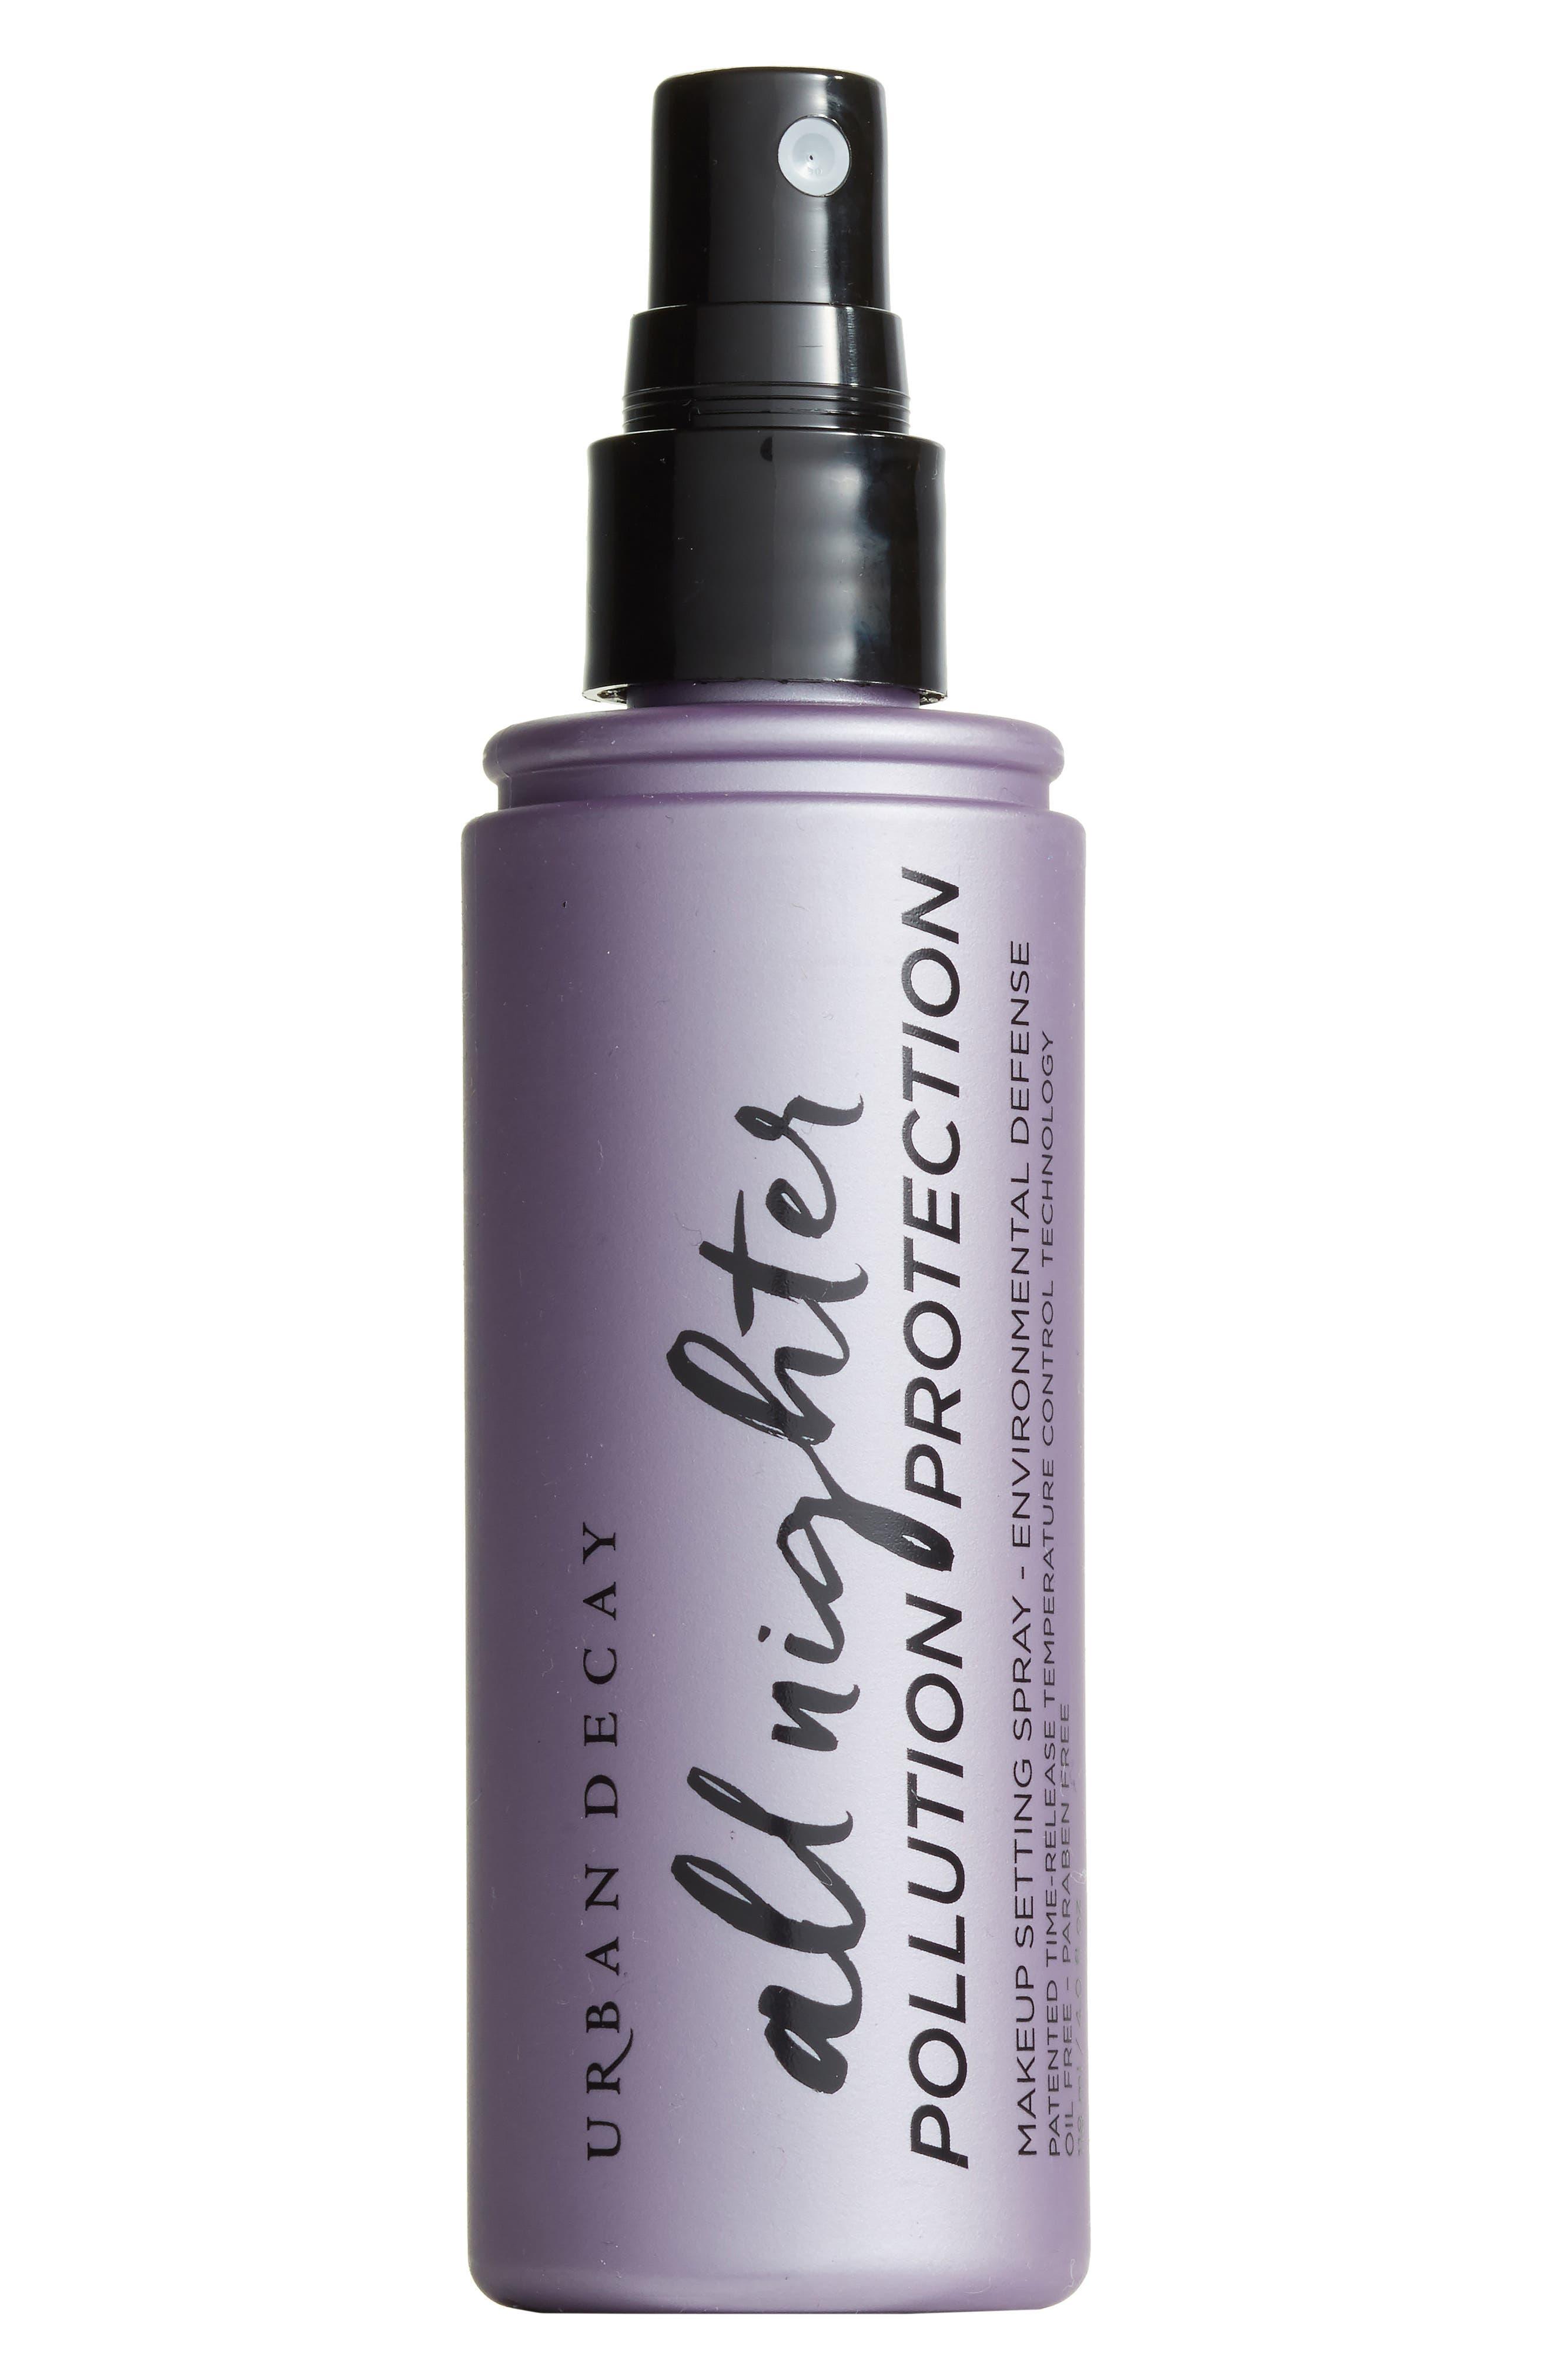 All Nighter Pollution Protection Environmental Defense Makeup Setting Spray,                             Main thumbnail 1, color,                             NO COLOR